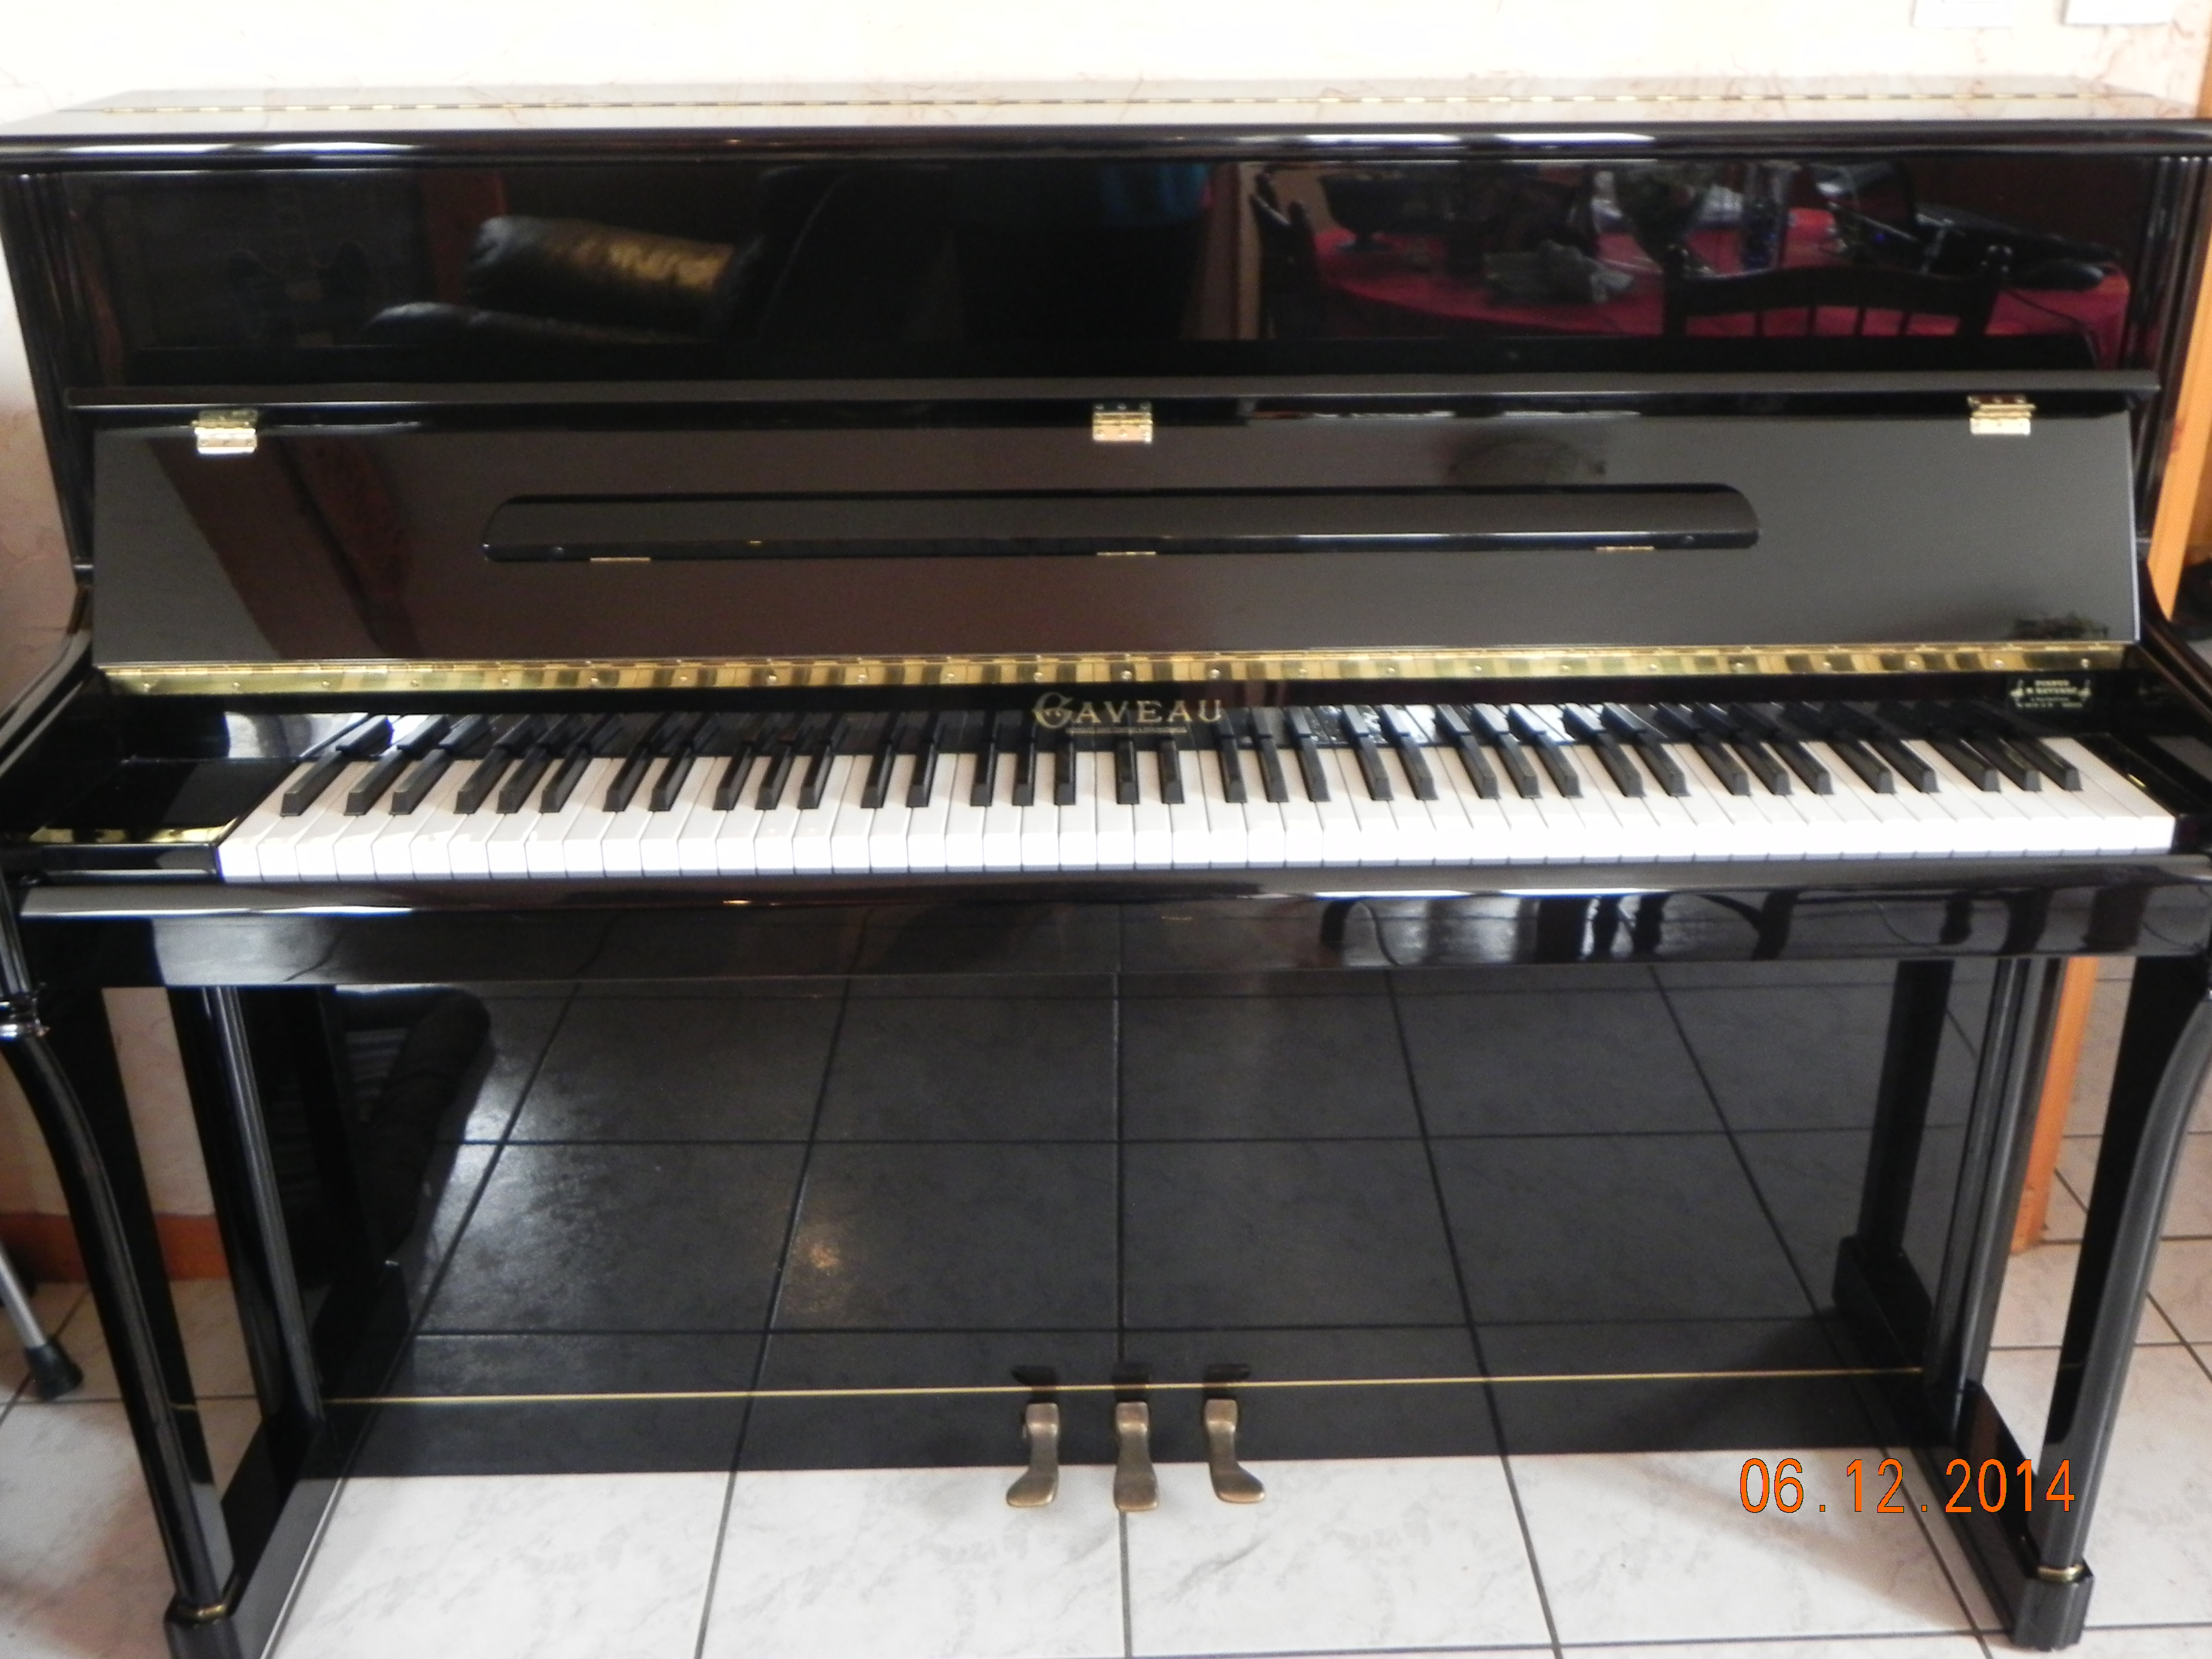 achat pianos acoustiques gaveau d 39 occasion audiofanzine. Black Bedroom Furniture Sets. Home Design Ideas